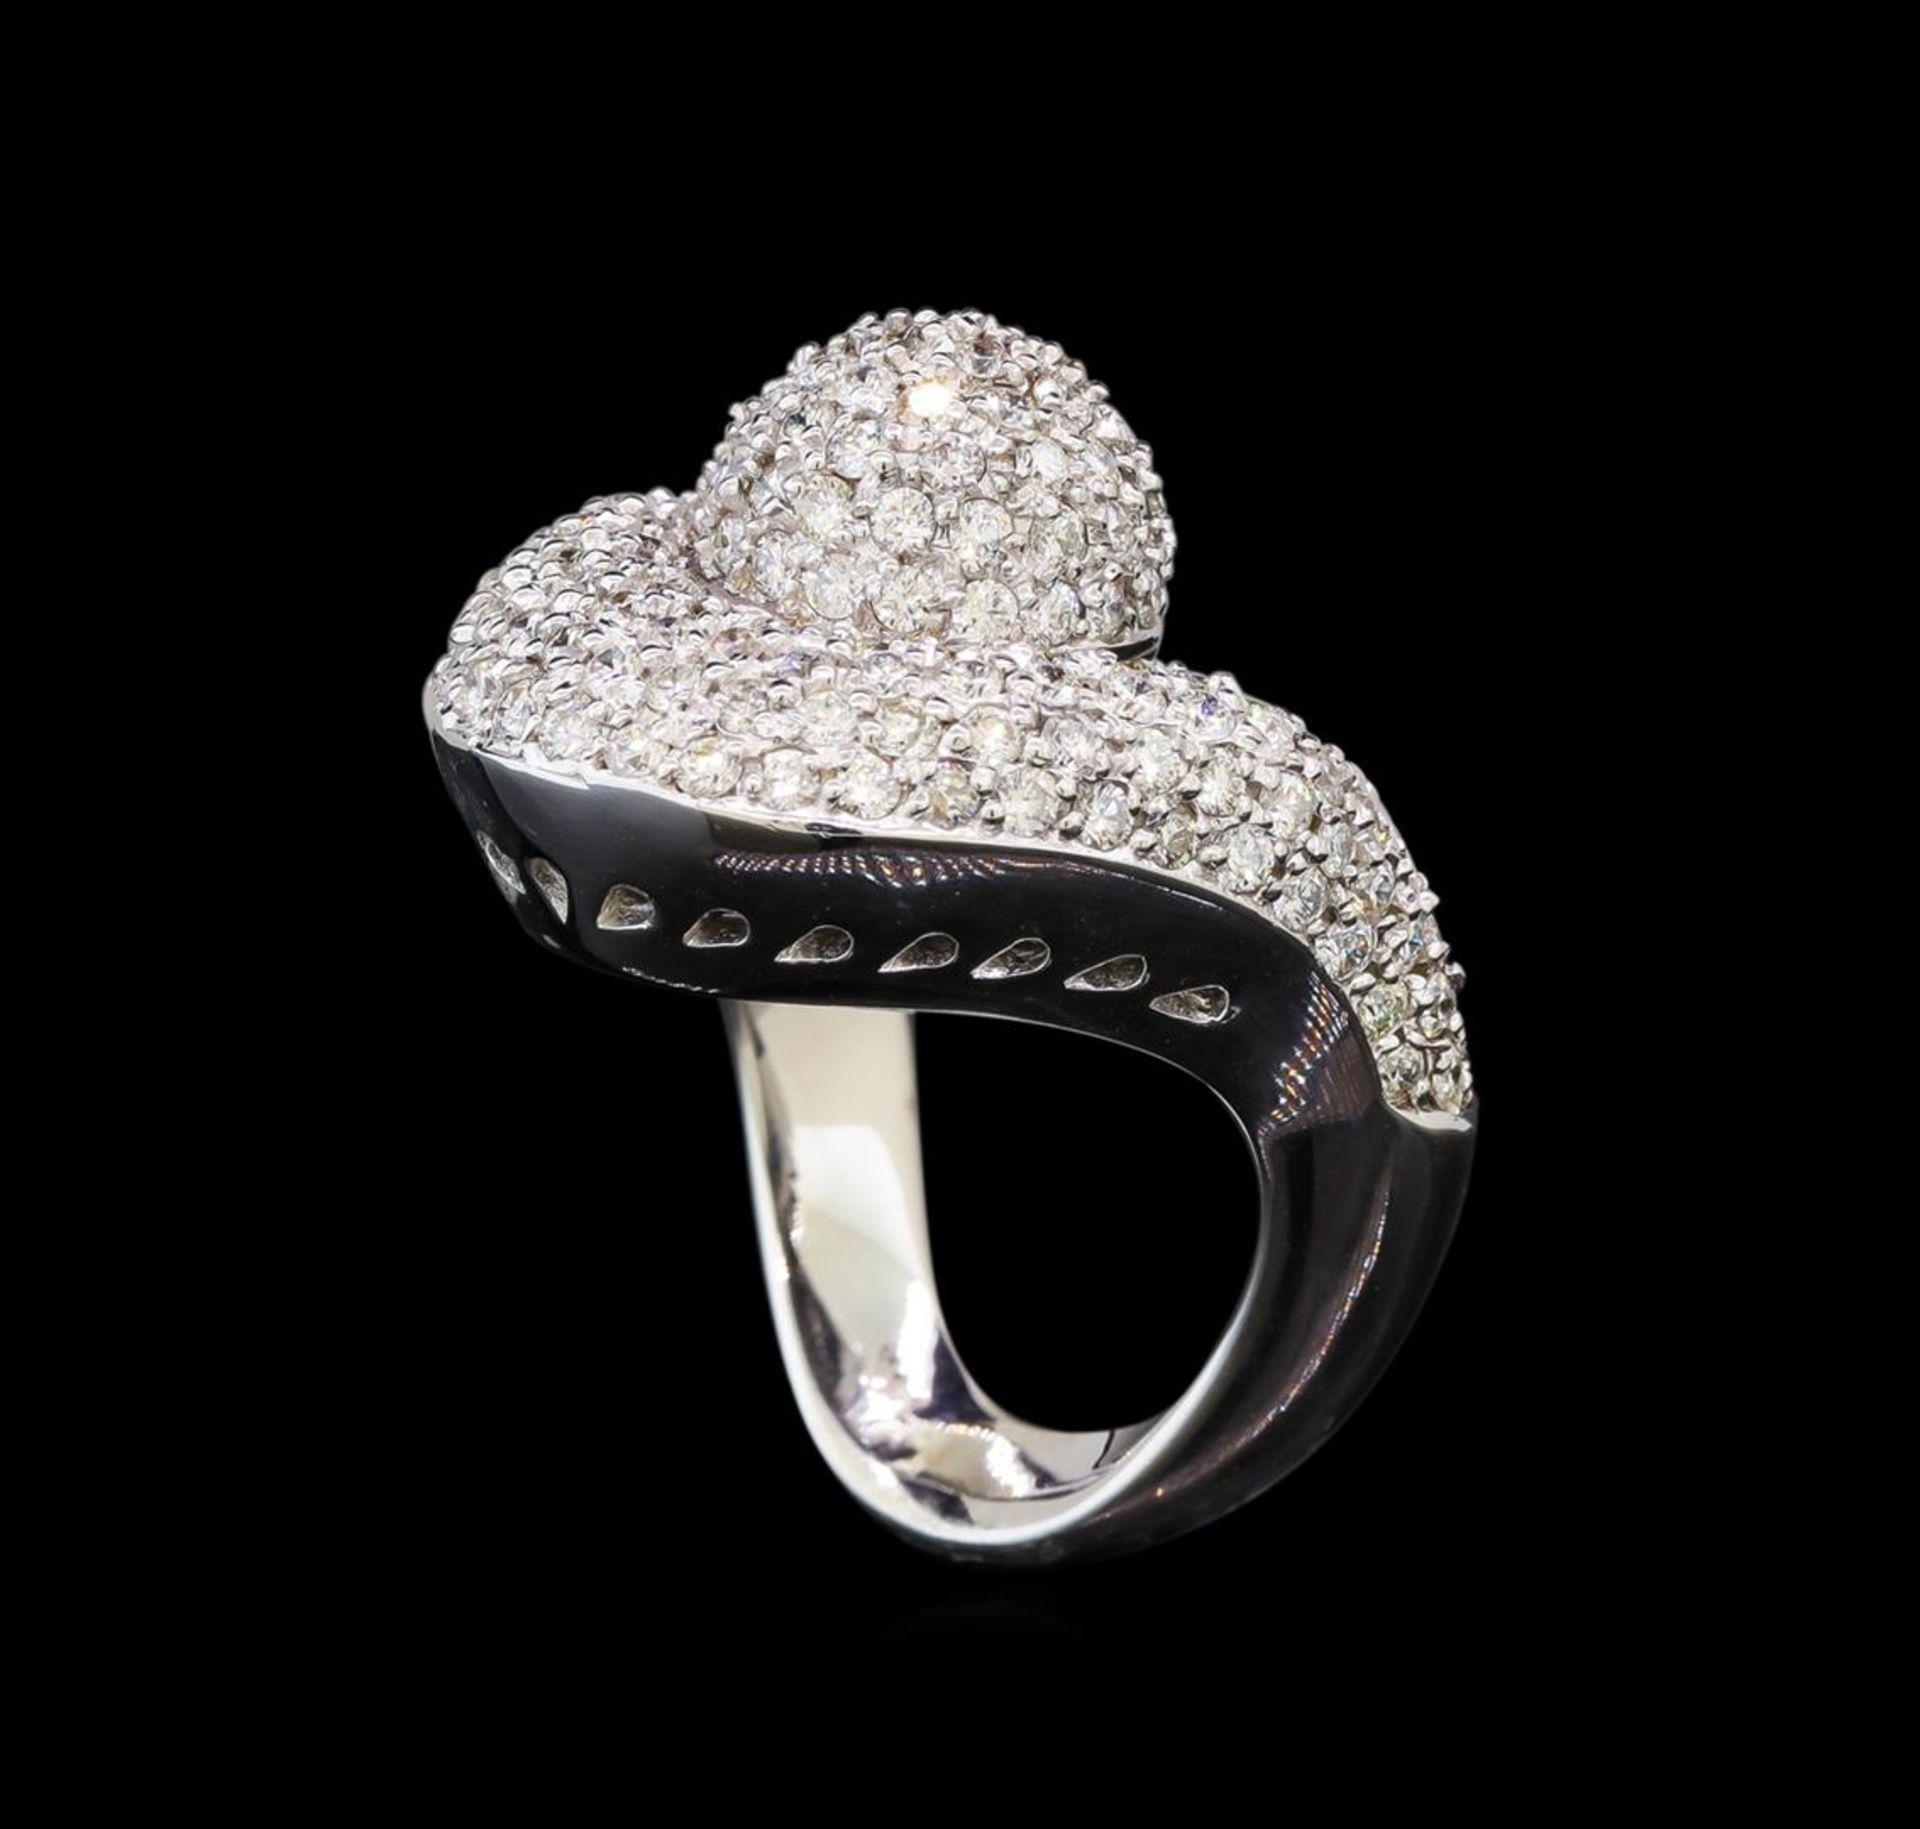 14KT White Gold 1.06 ctw Diamond Ring - Image 4 of 5